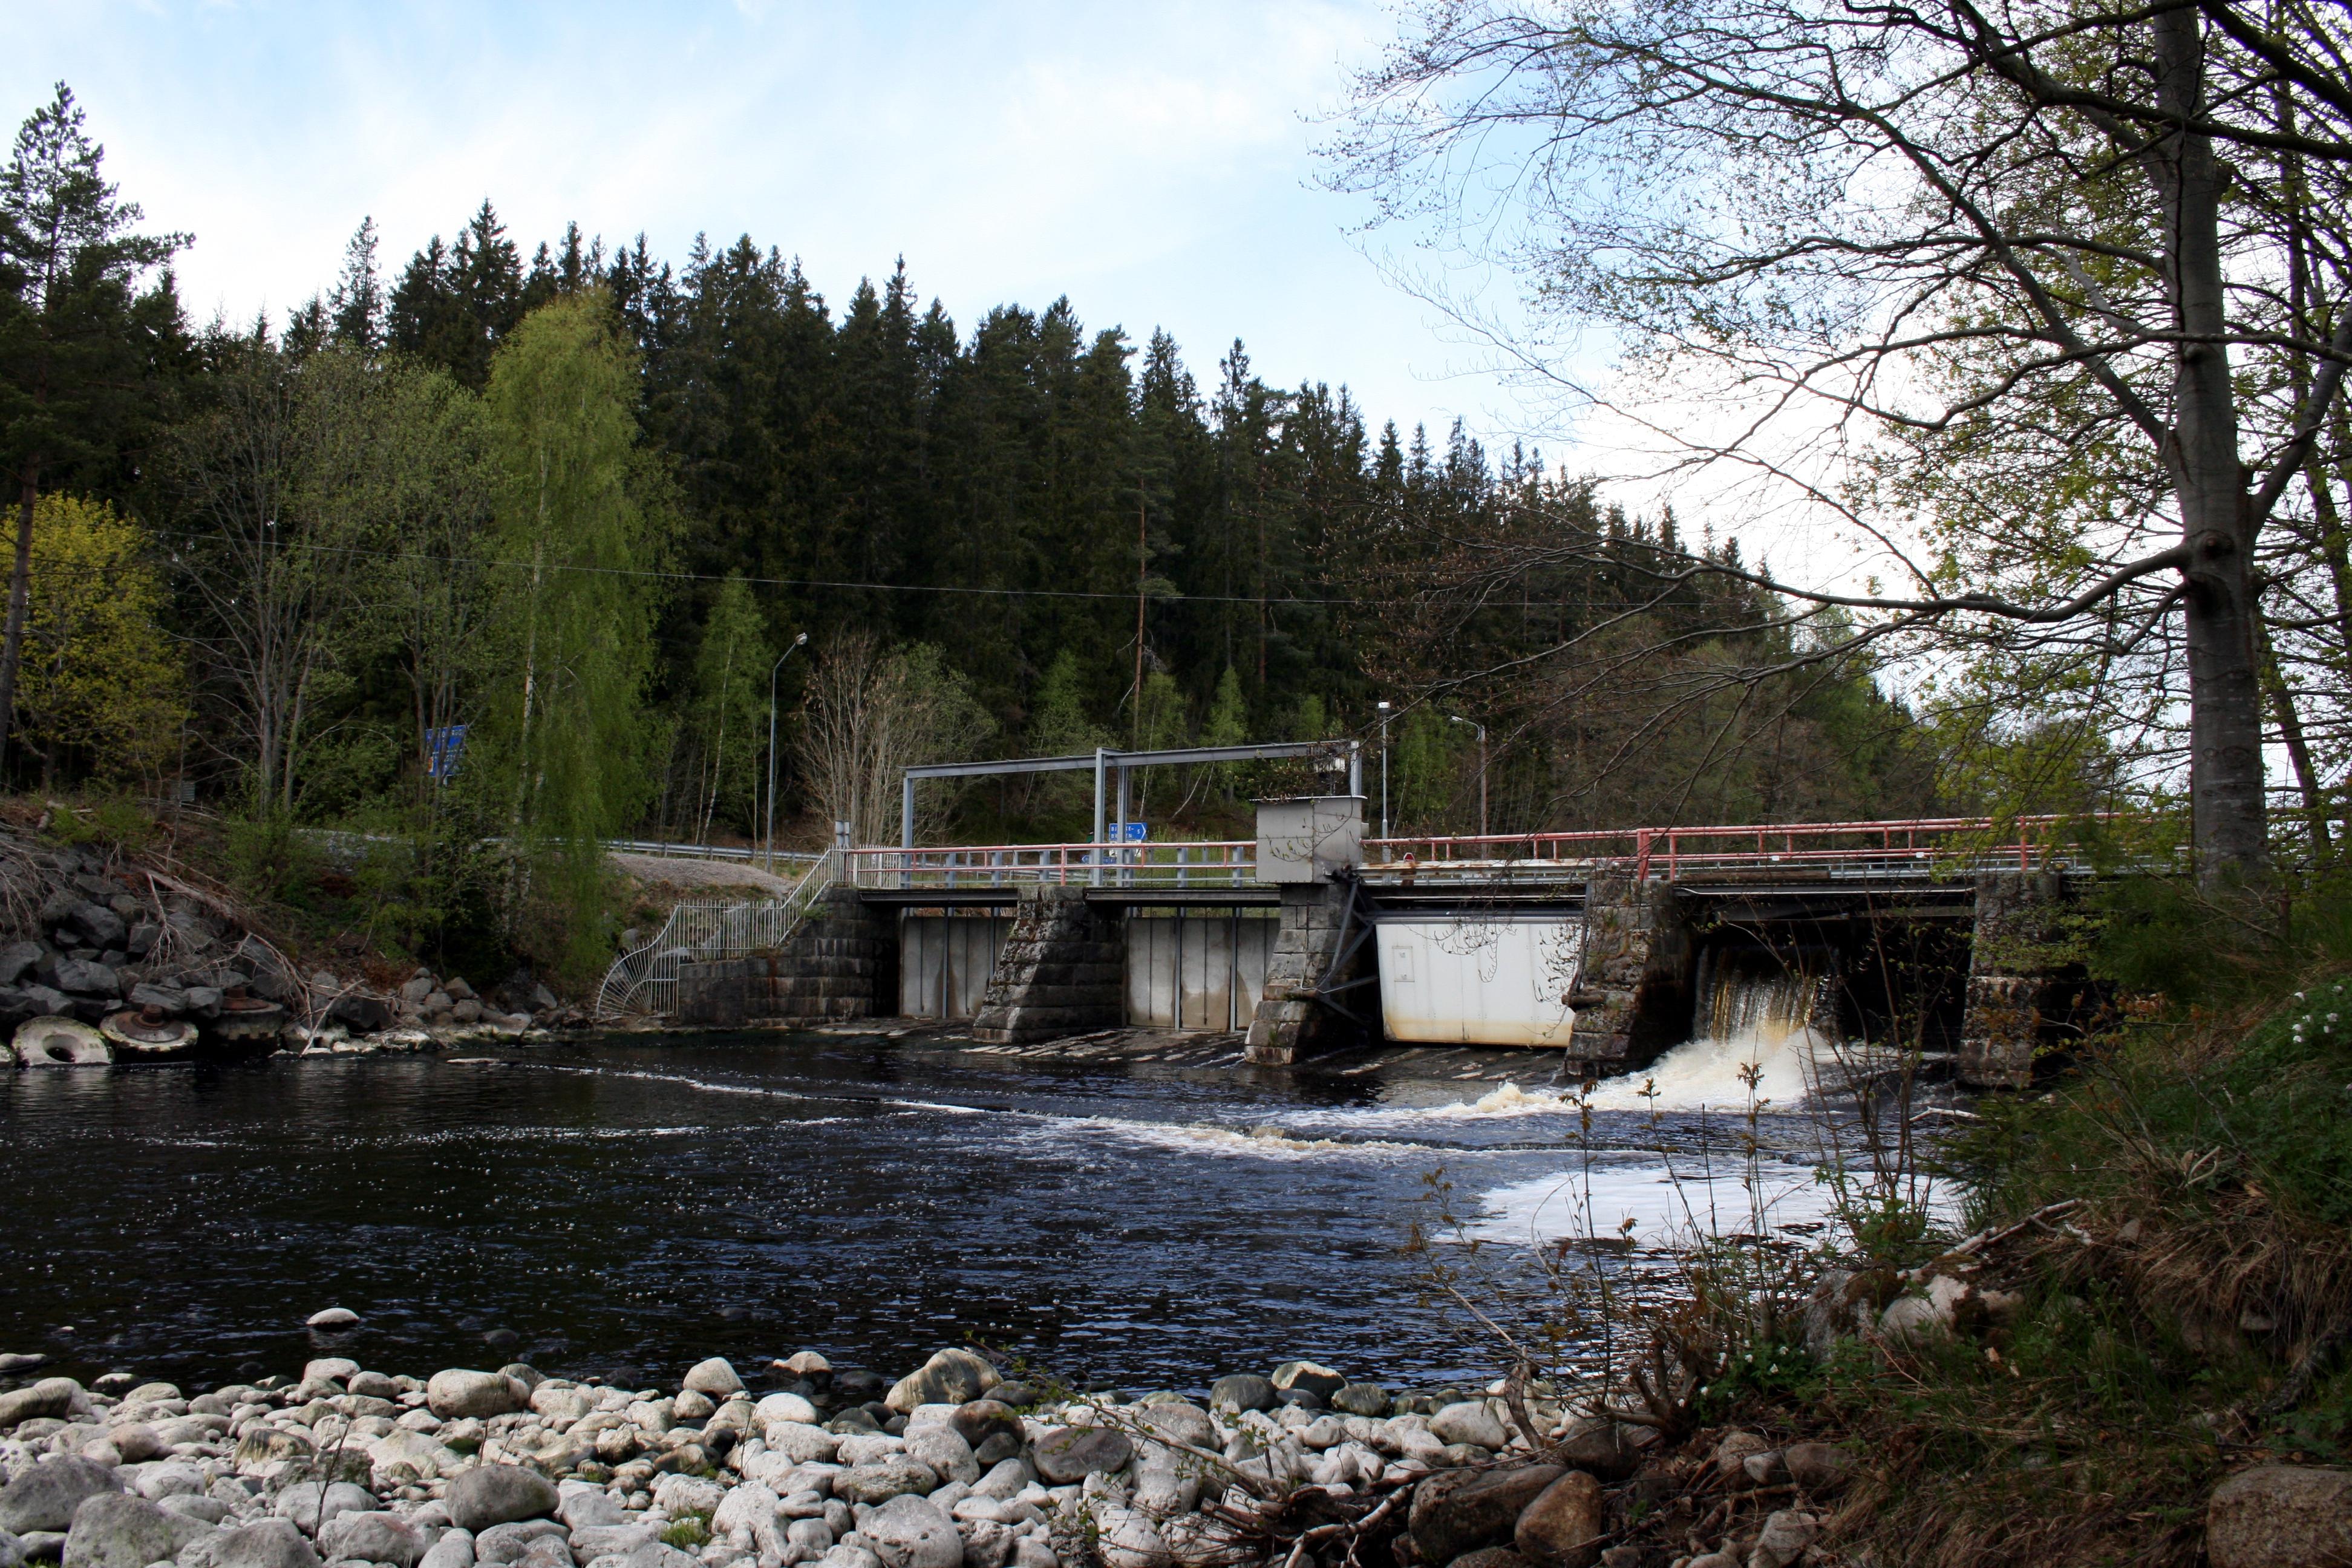 Toftsa, Almundsryd (G) - Bo Lindkvist Hemsida